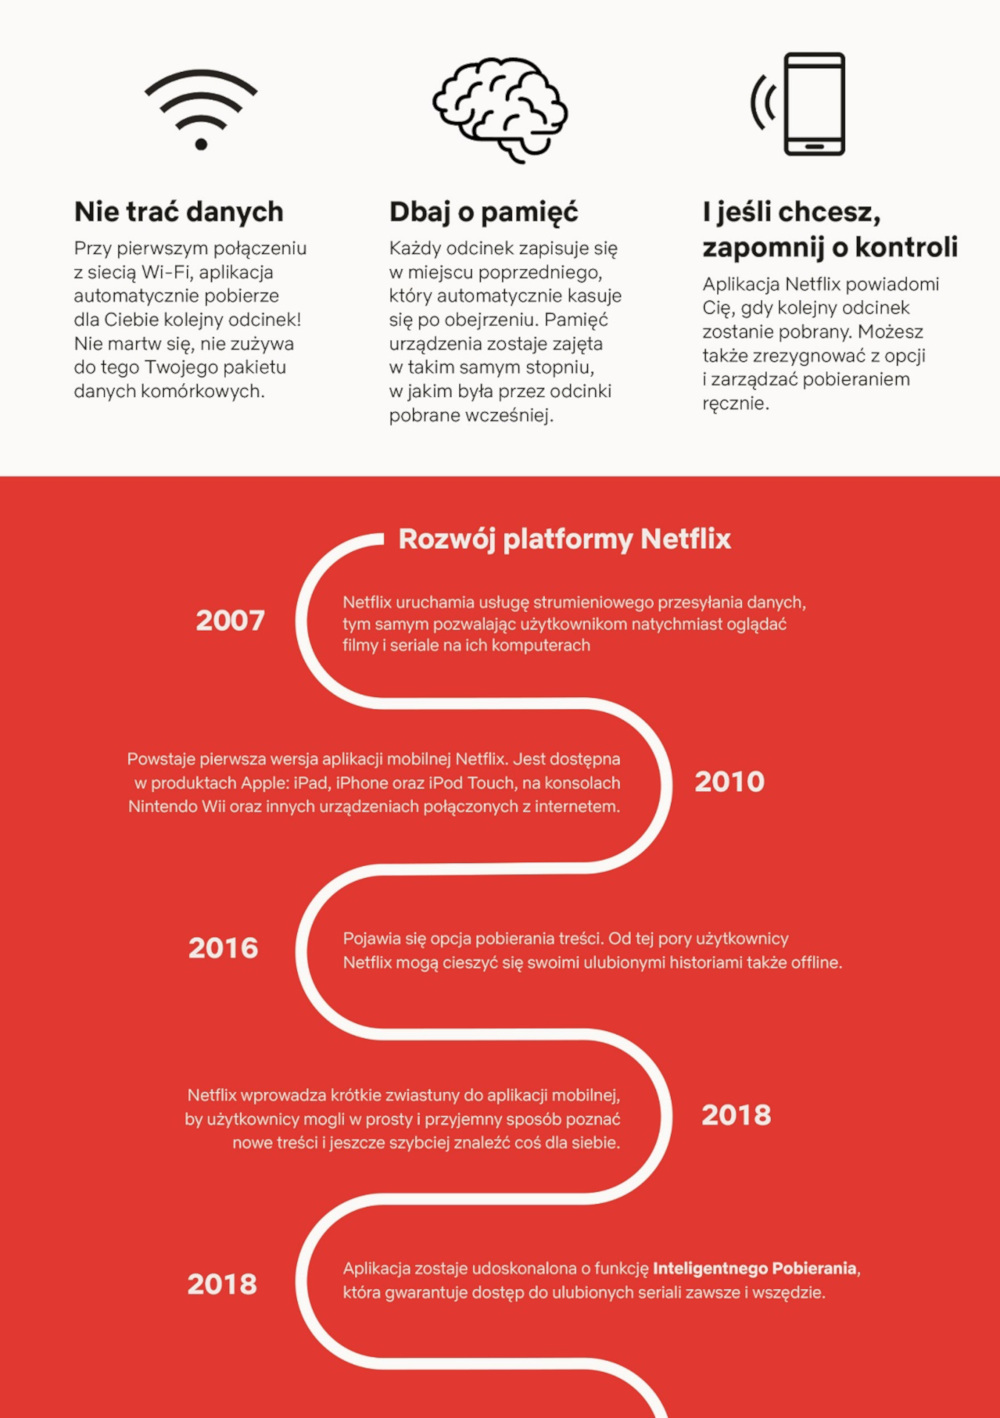 Rozwój platformy Netflix (infografika)